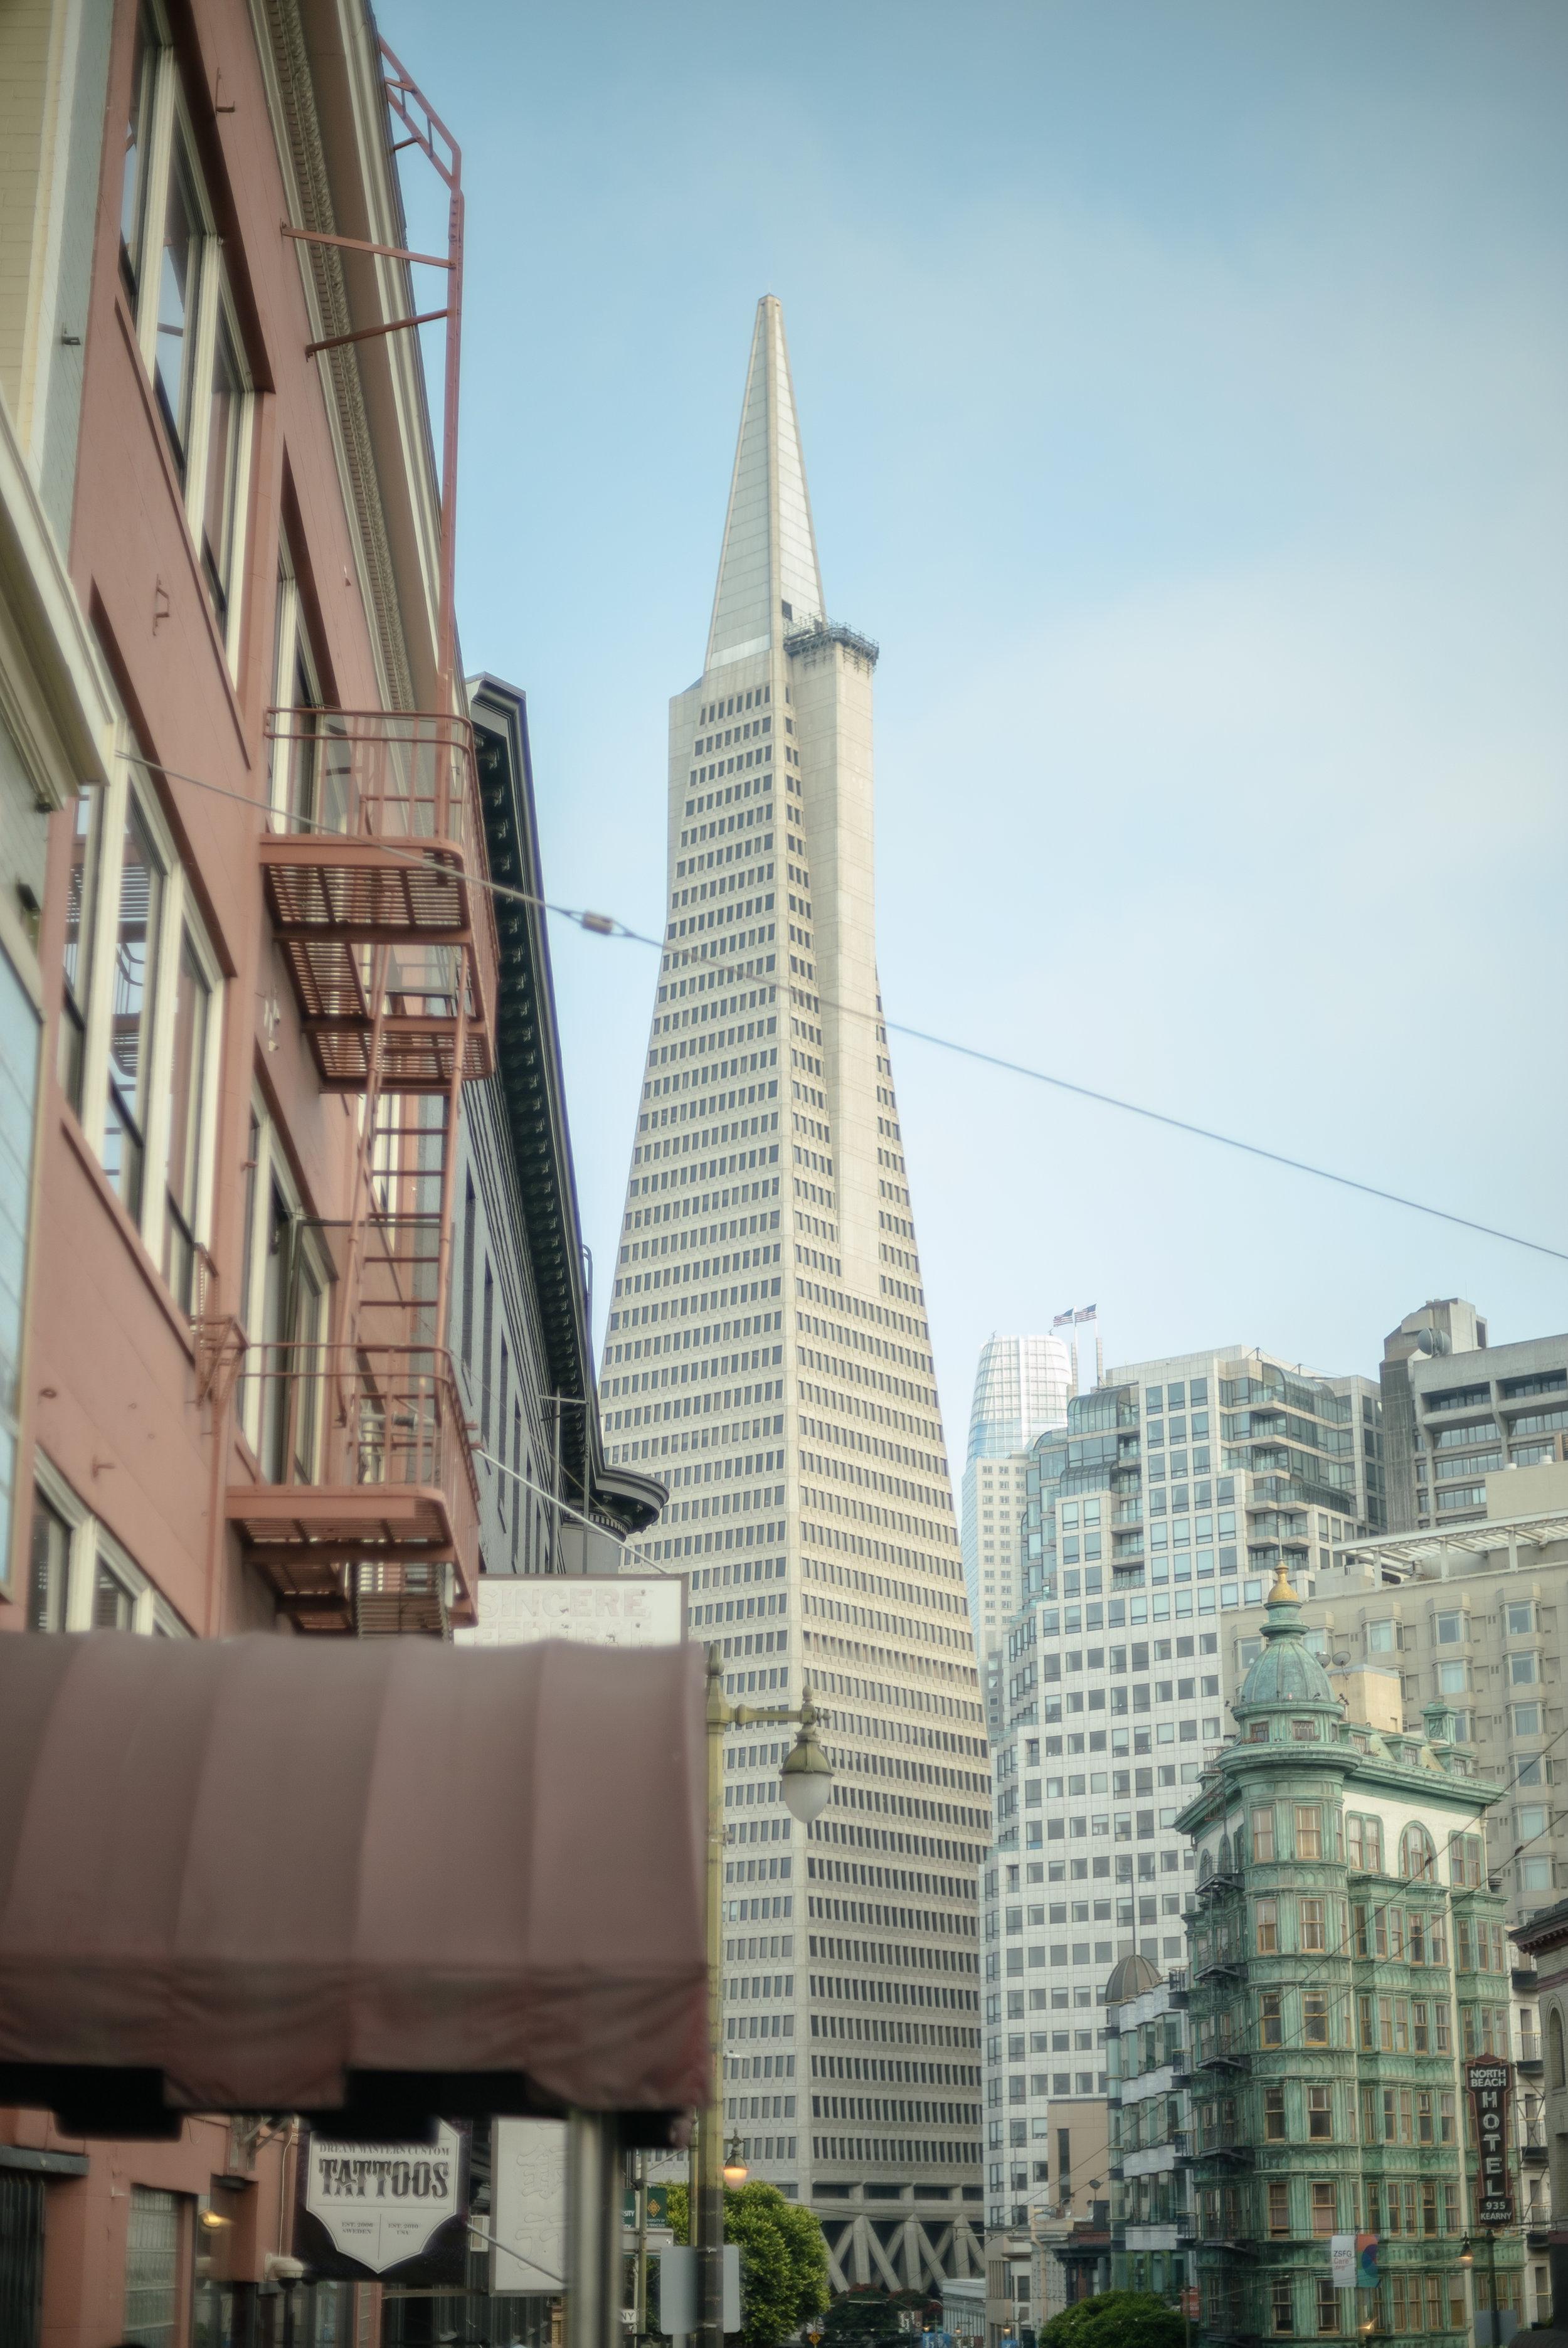 Transamerica-Pyramid-San-Francisco.jpg